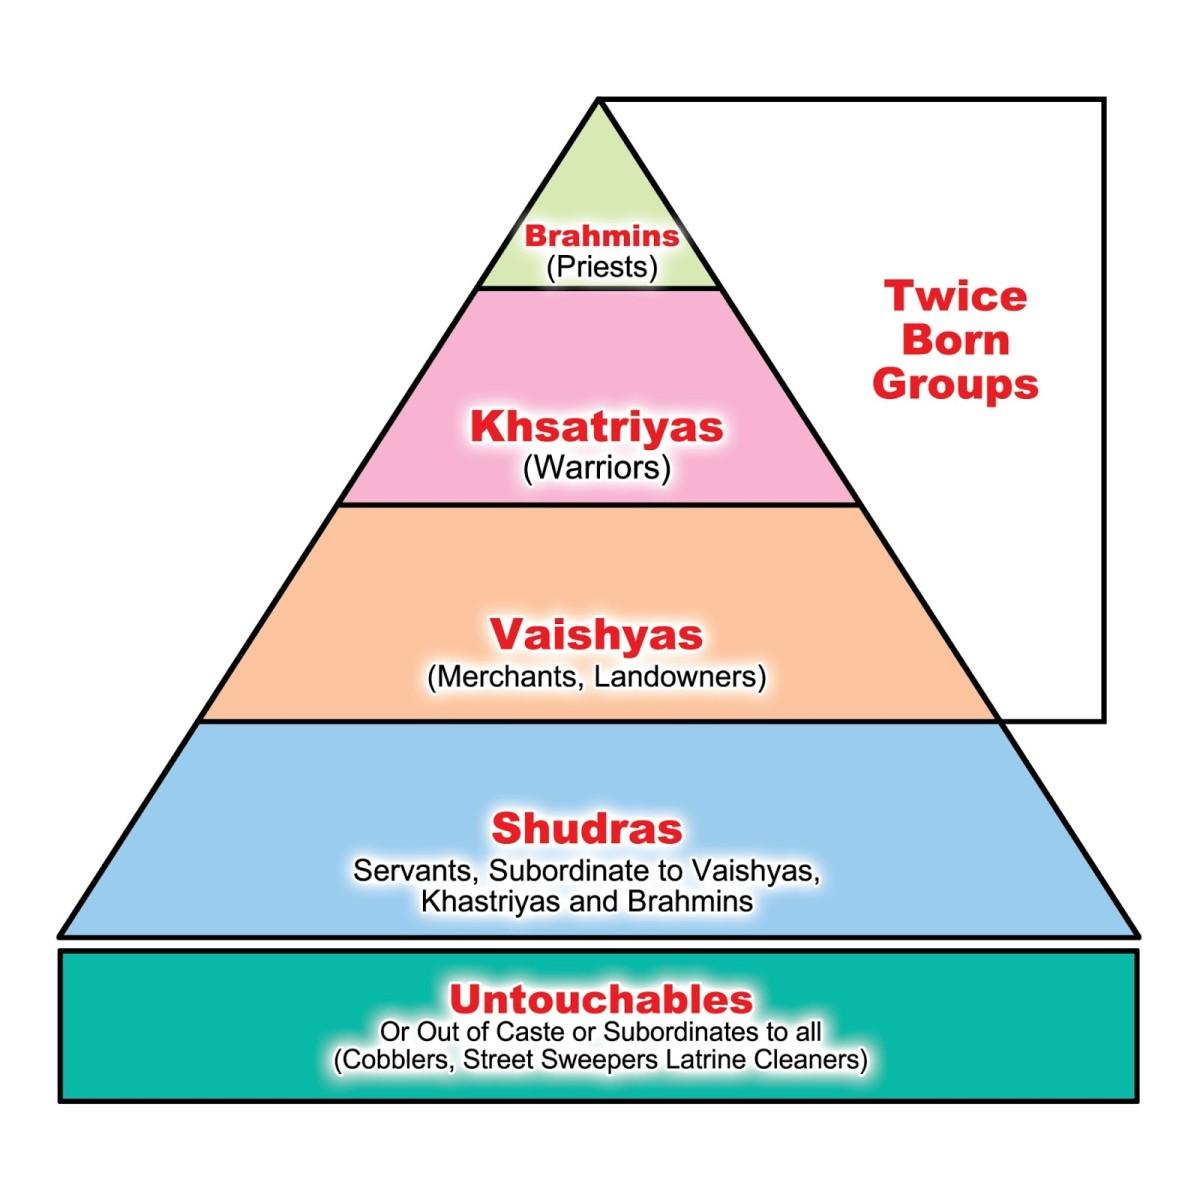 Origin of the Indian Caste System